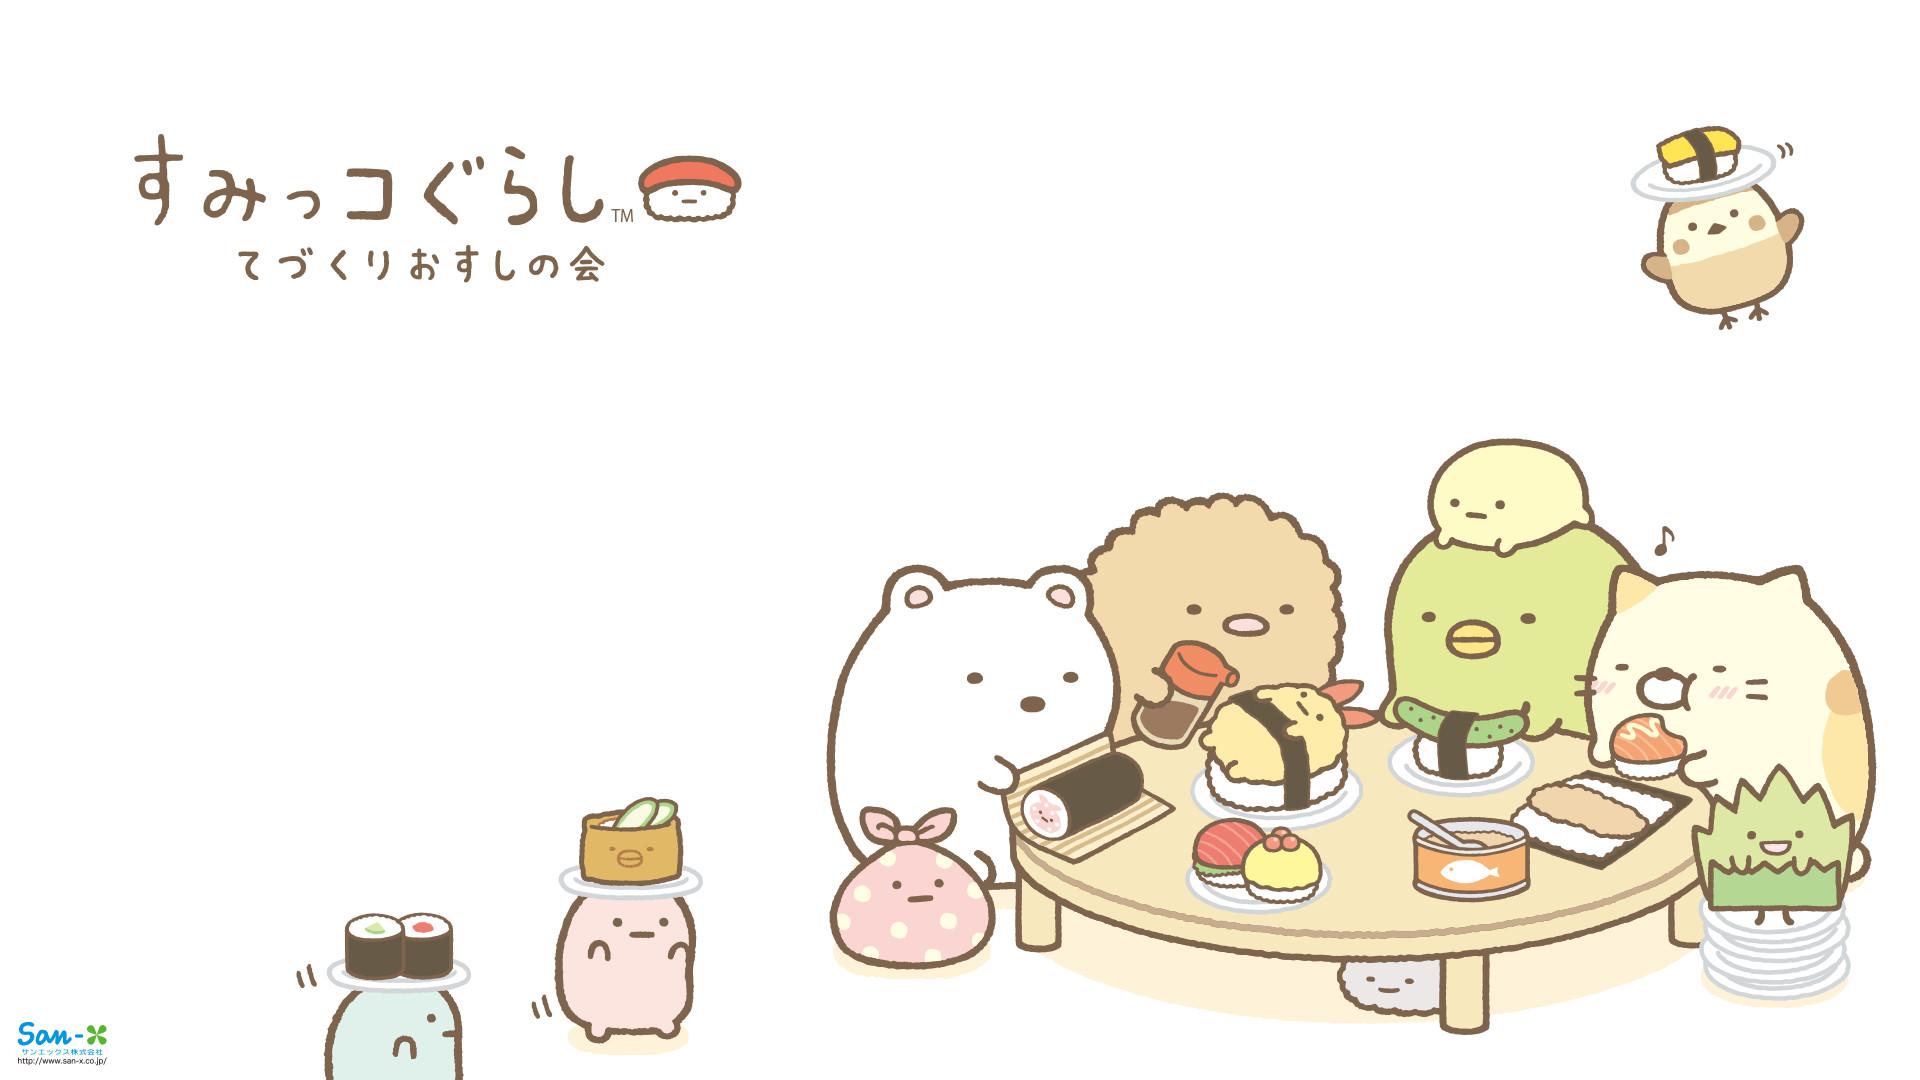 Kawaii Cute Anime Wallpapers For Laptop Gambarku